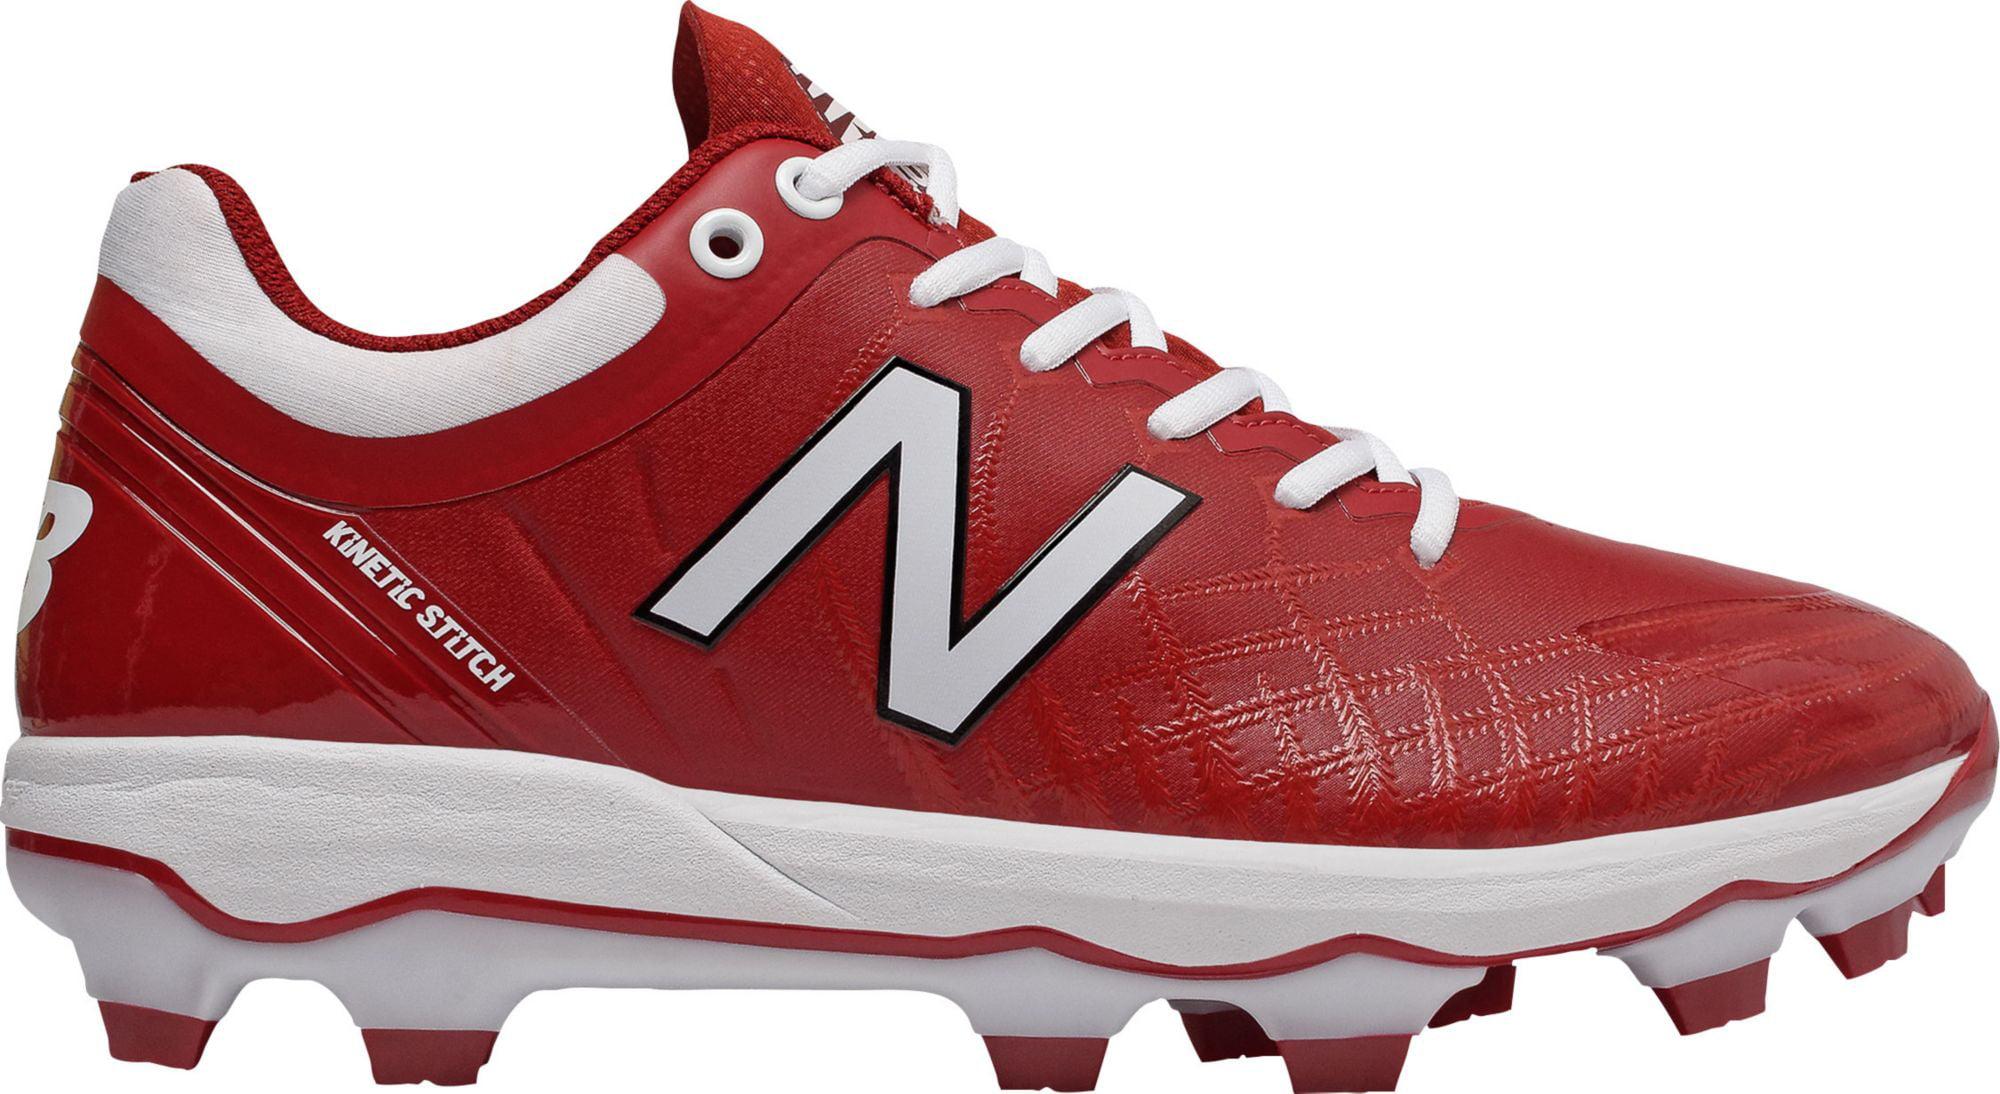 red new balance baseball cleats Online